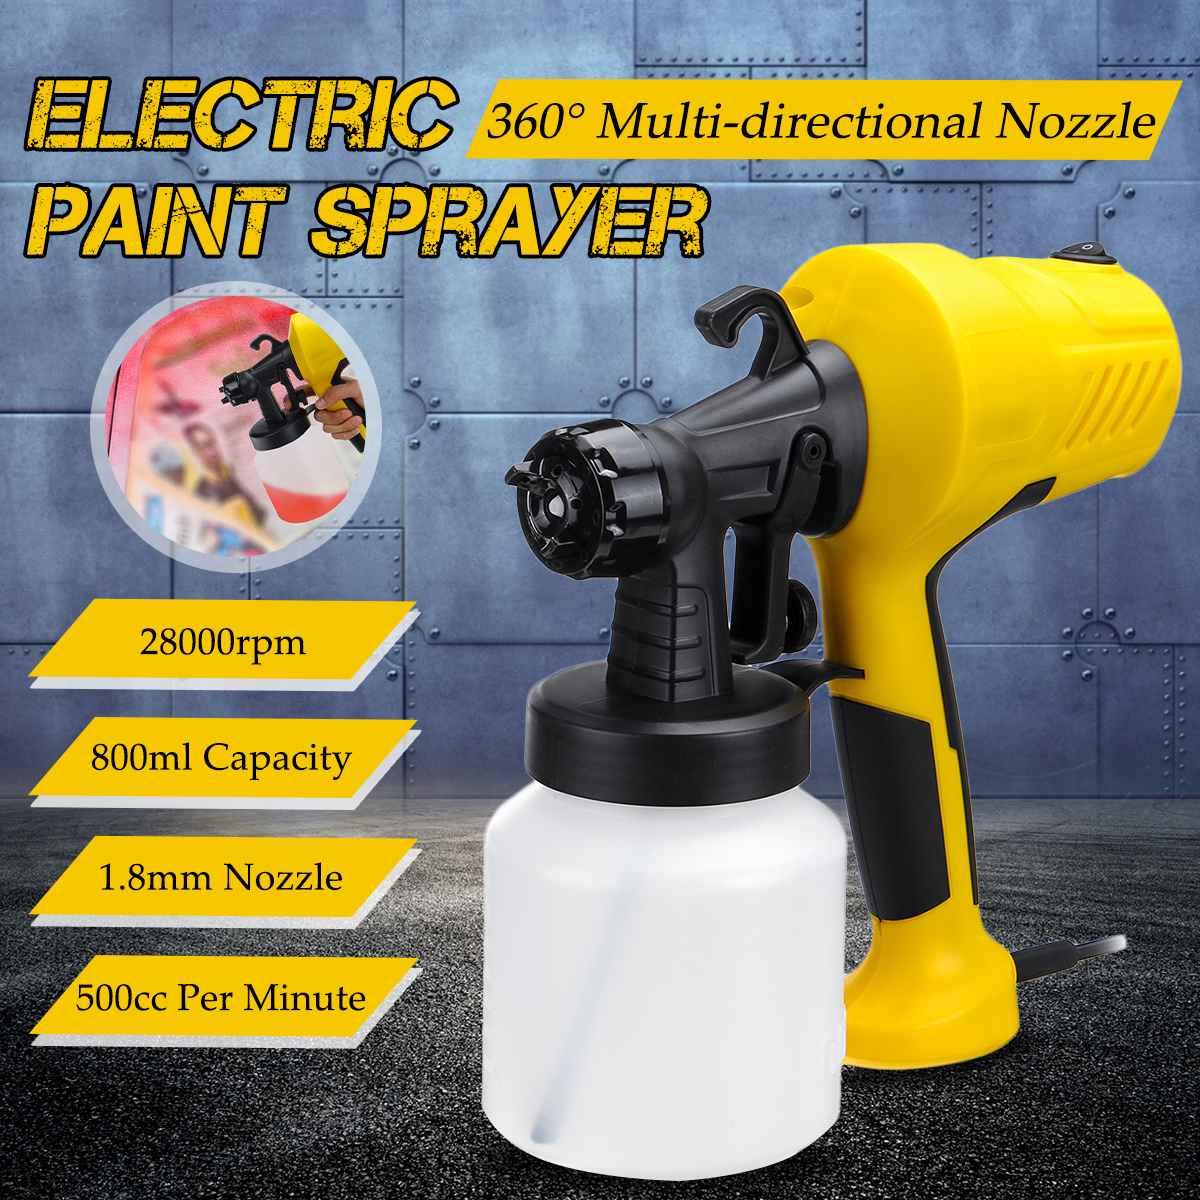 Doersupp 28000r/min Electric Spray Gun' Paint Sprayer Handheld Flow Control Airless Painting Three Spray Patterns Adjustable